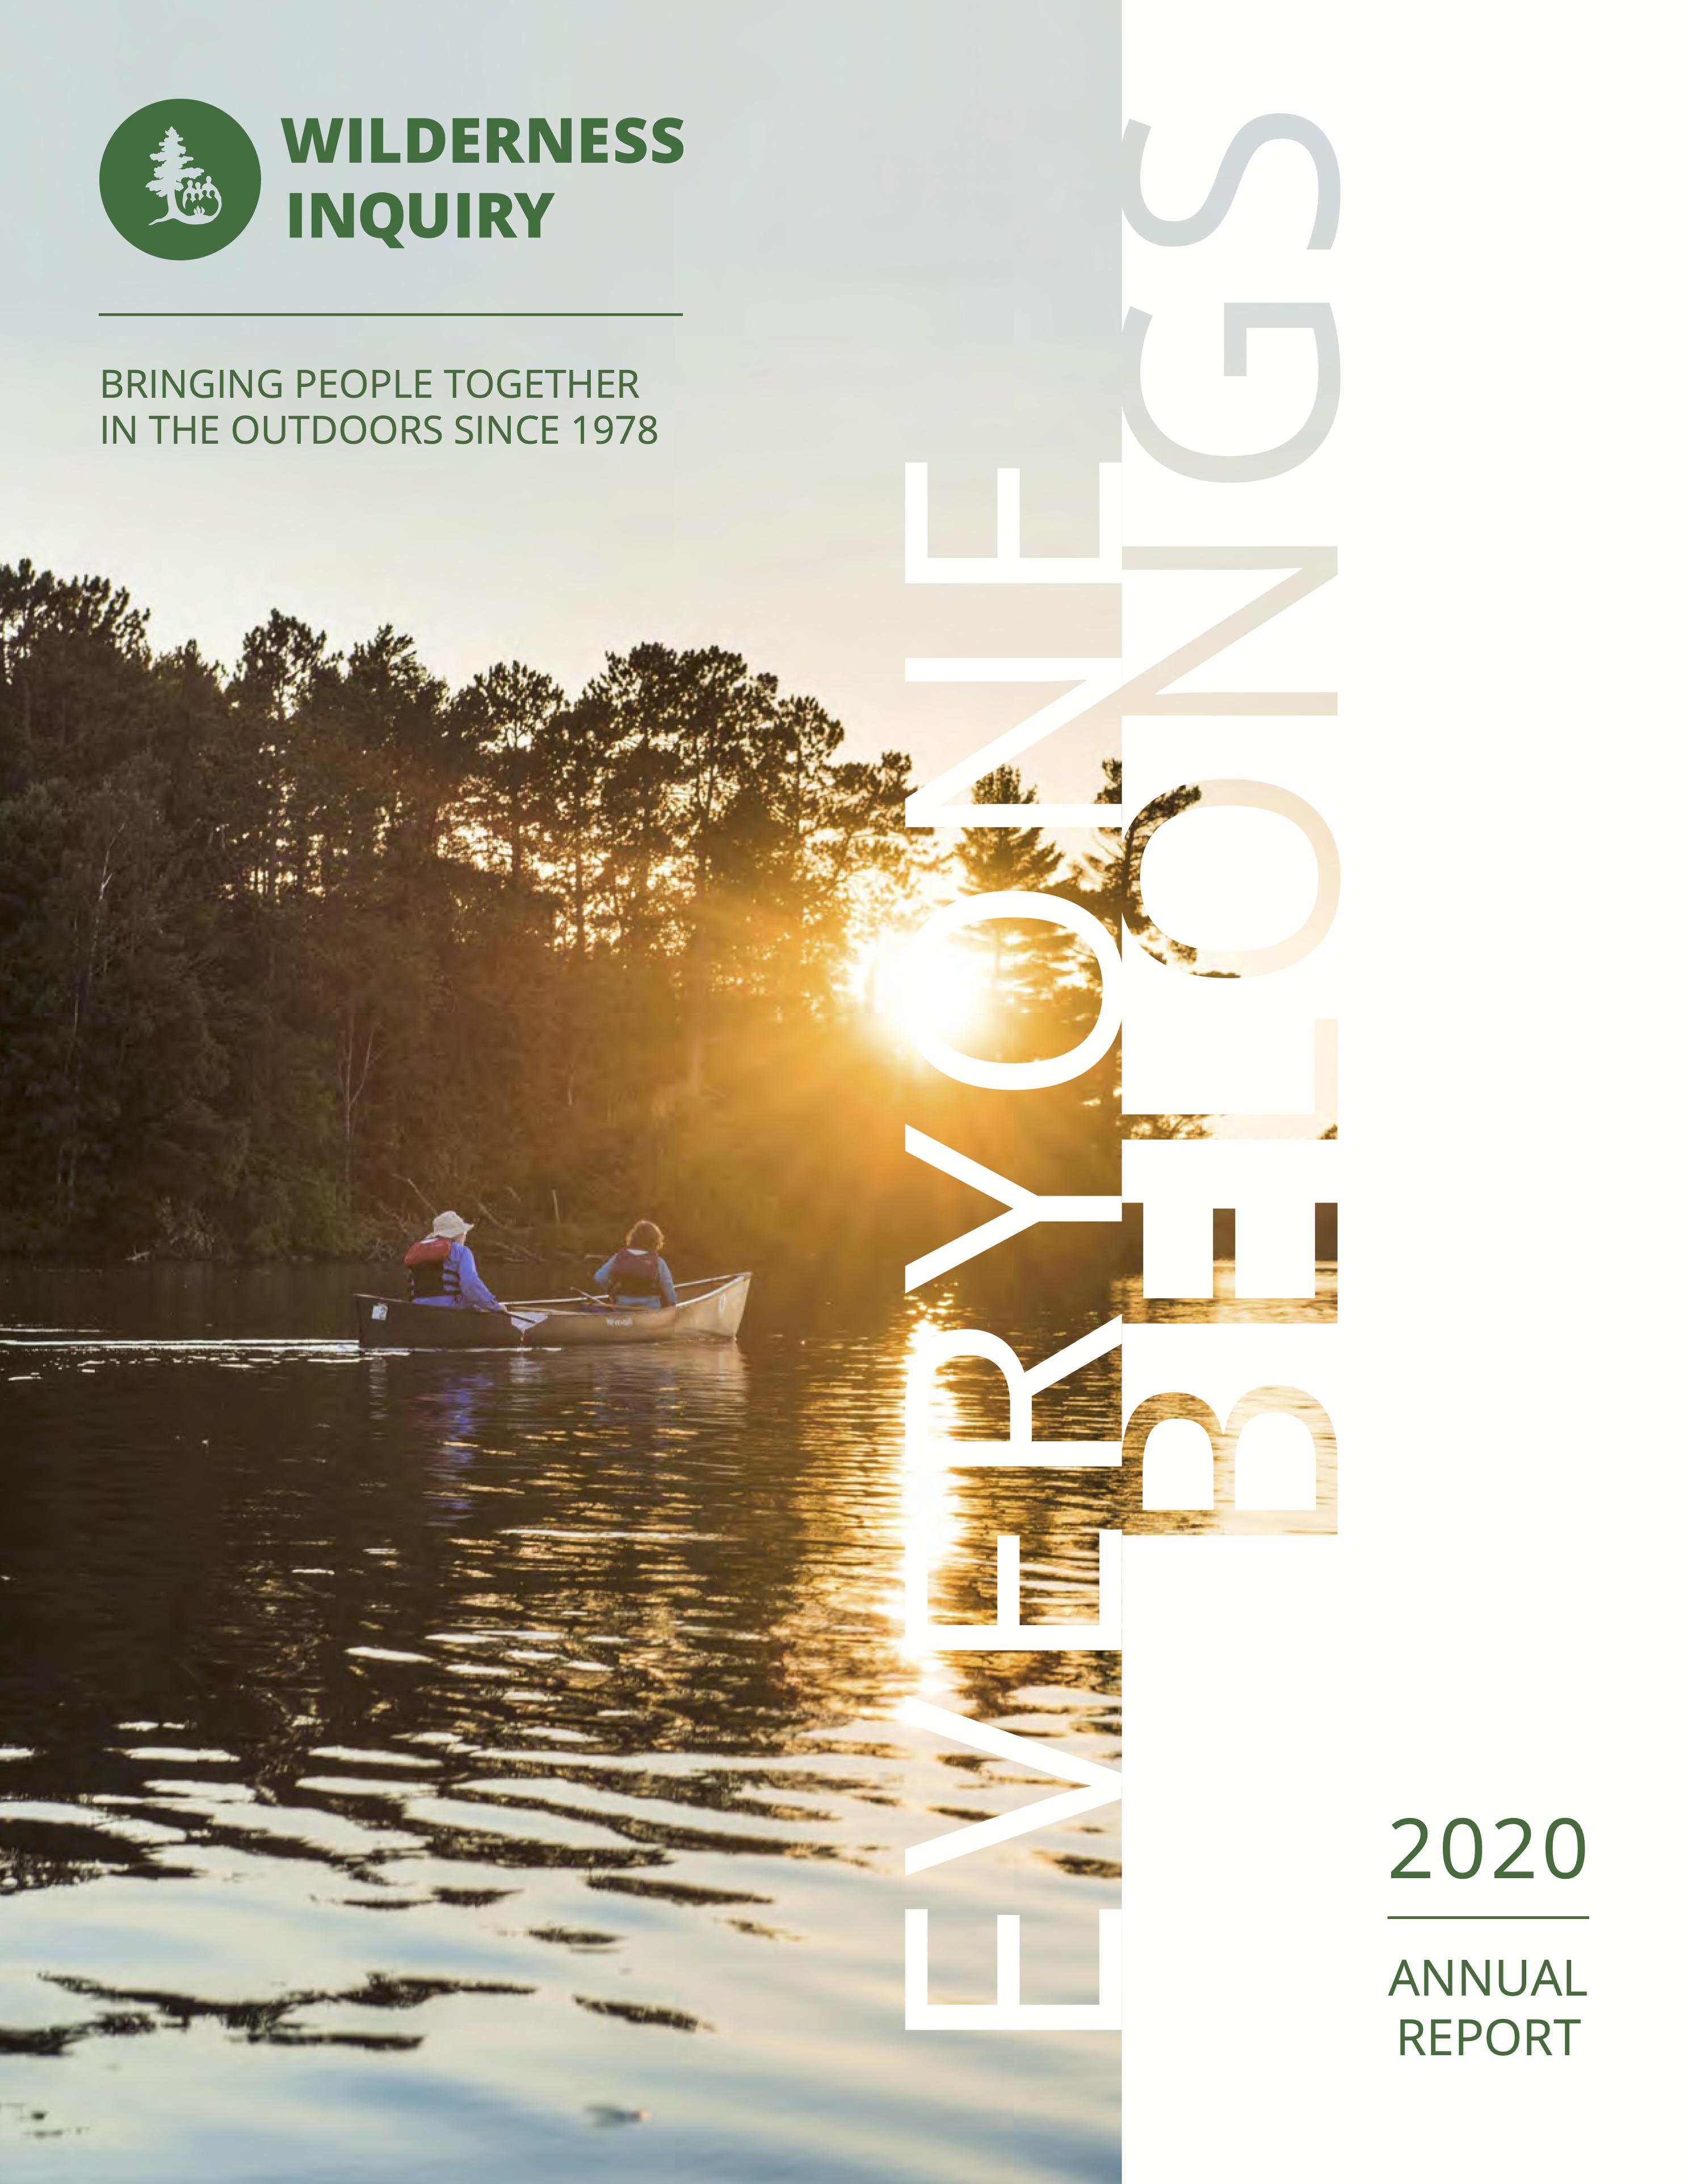 2019 Wilderness Inquiry Annual Report